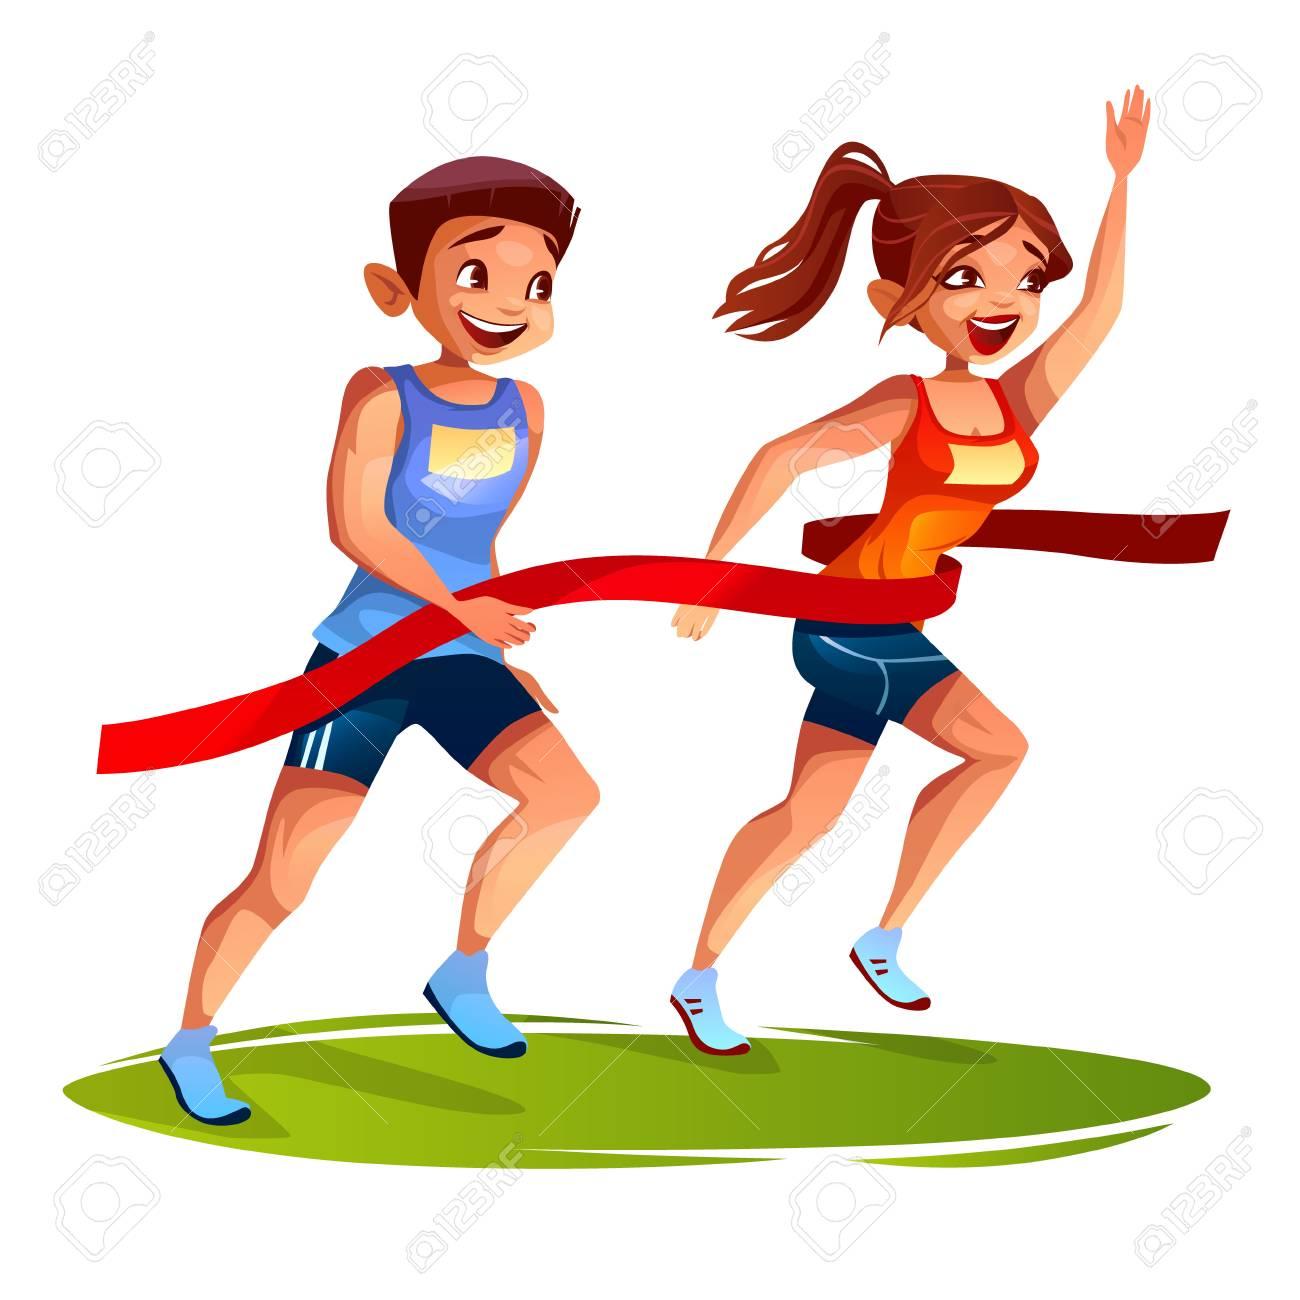 Kids Running Race Clip Art - Royalty Free - GoGraph